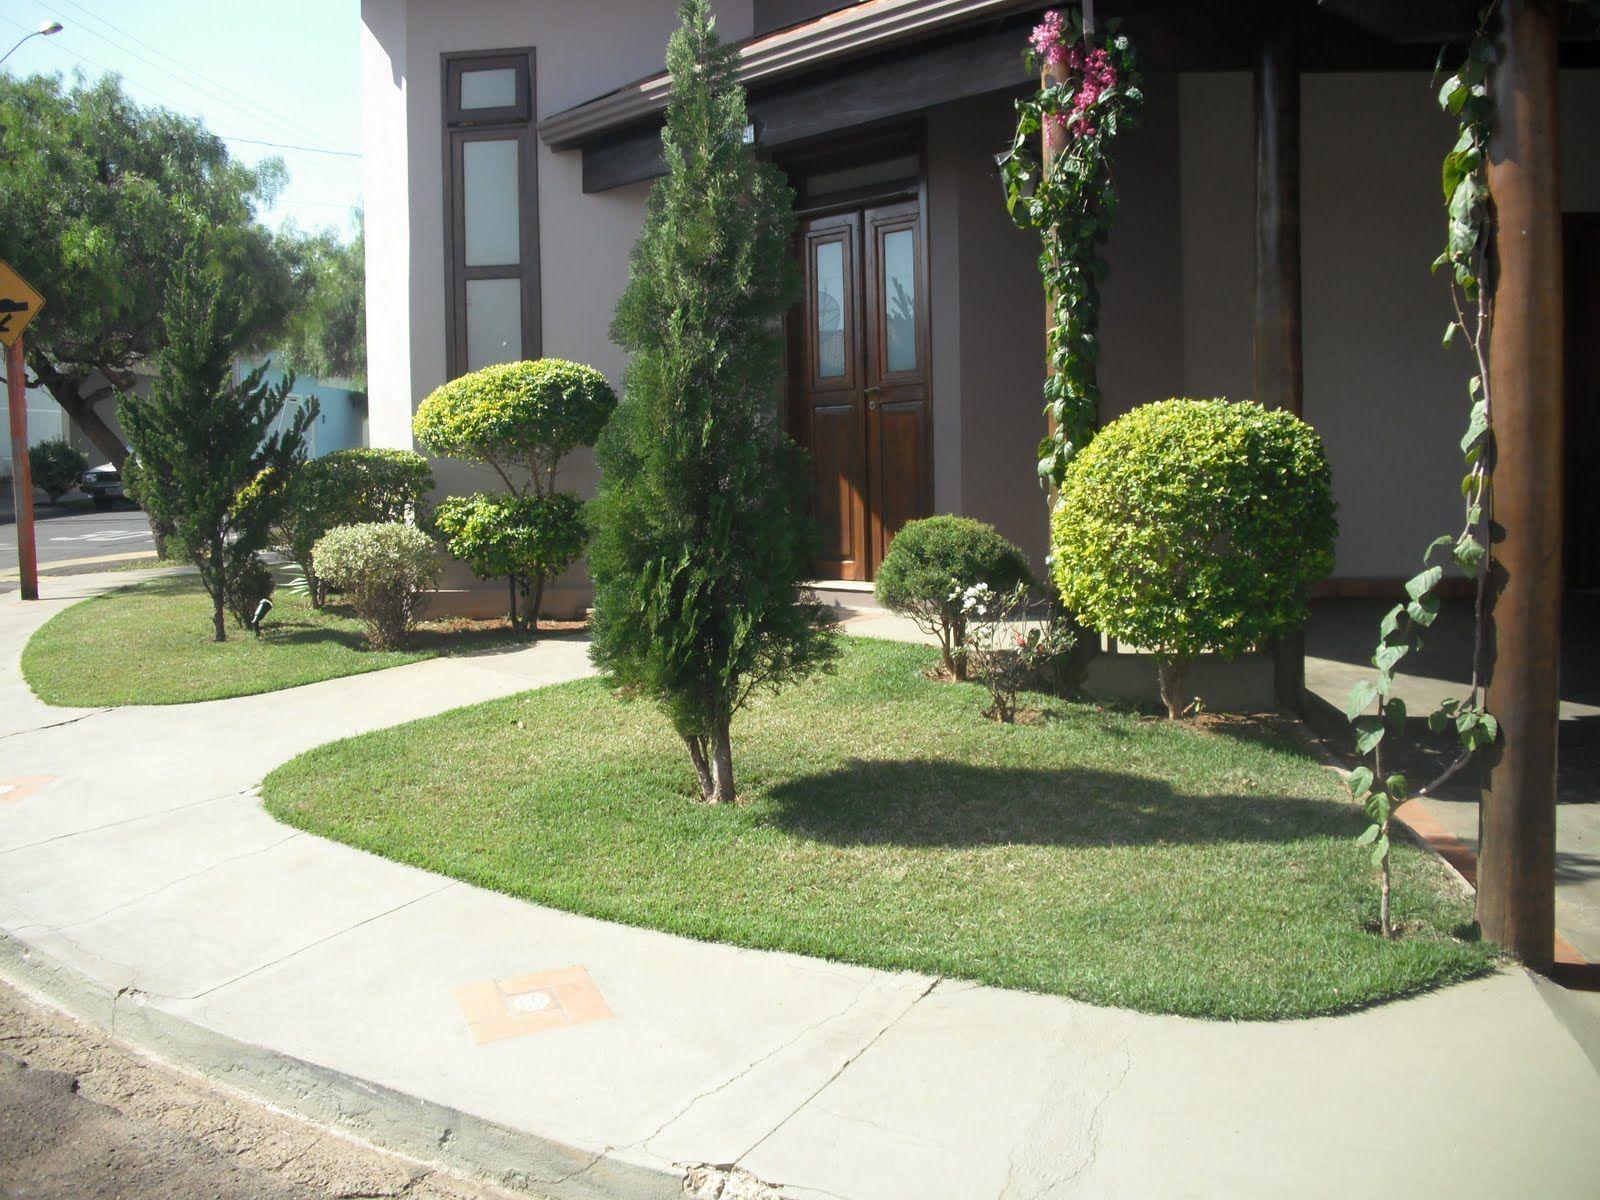 Modelos de jardins residenciais para frente de casa | Fachadas ...